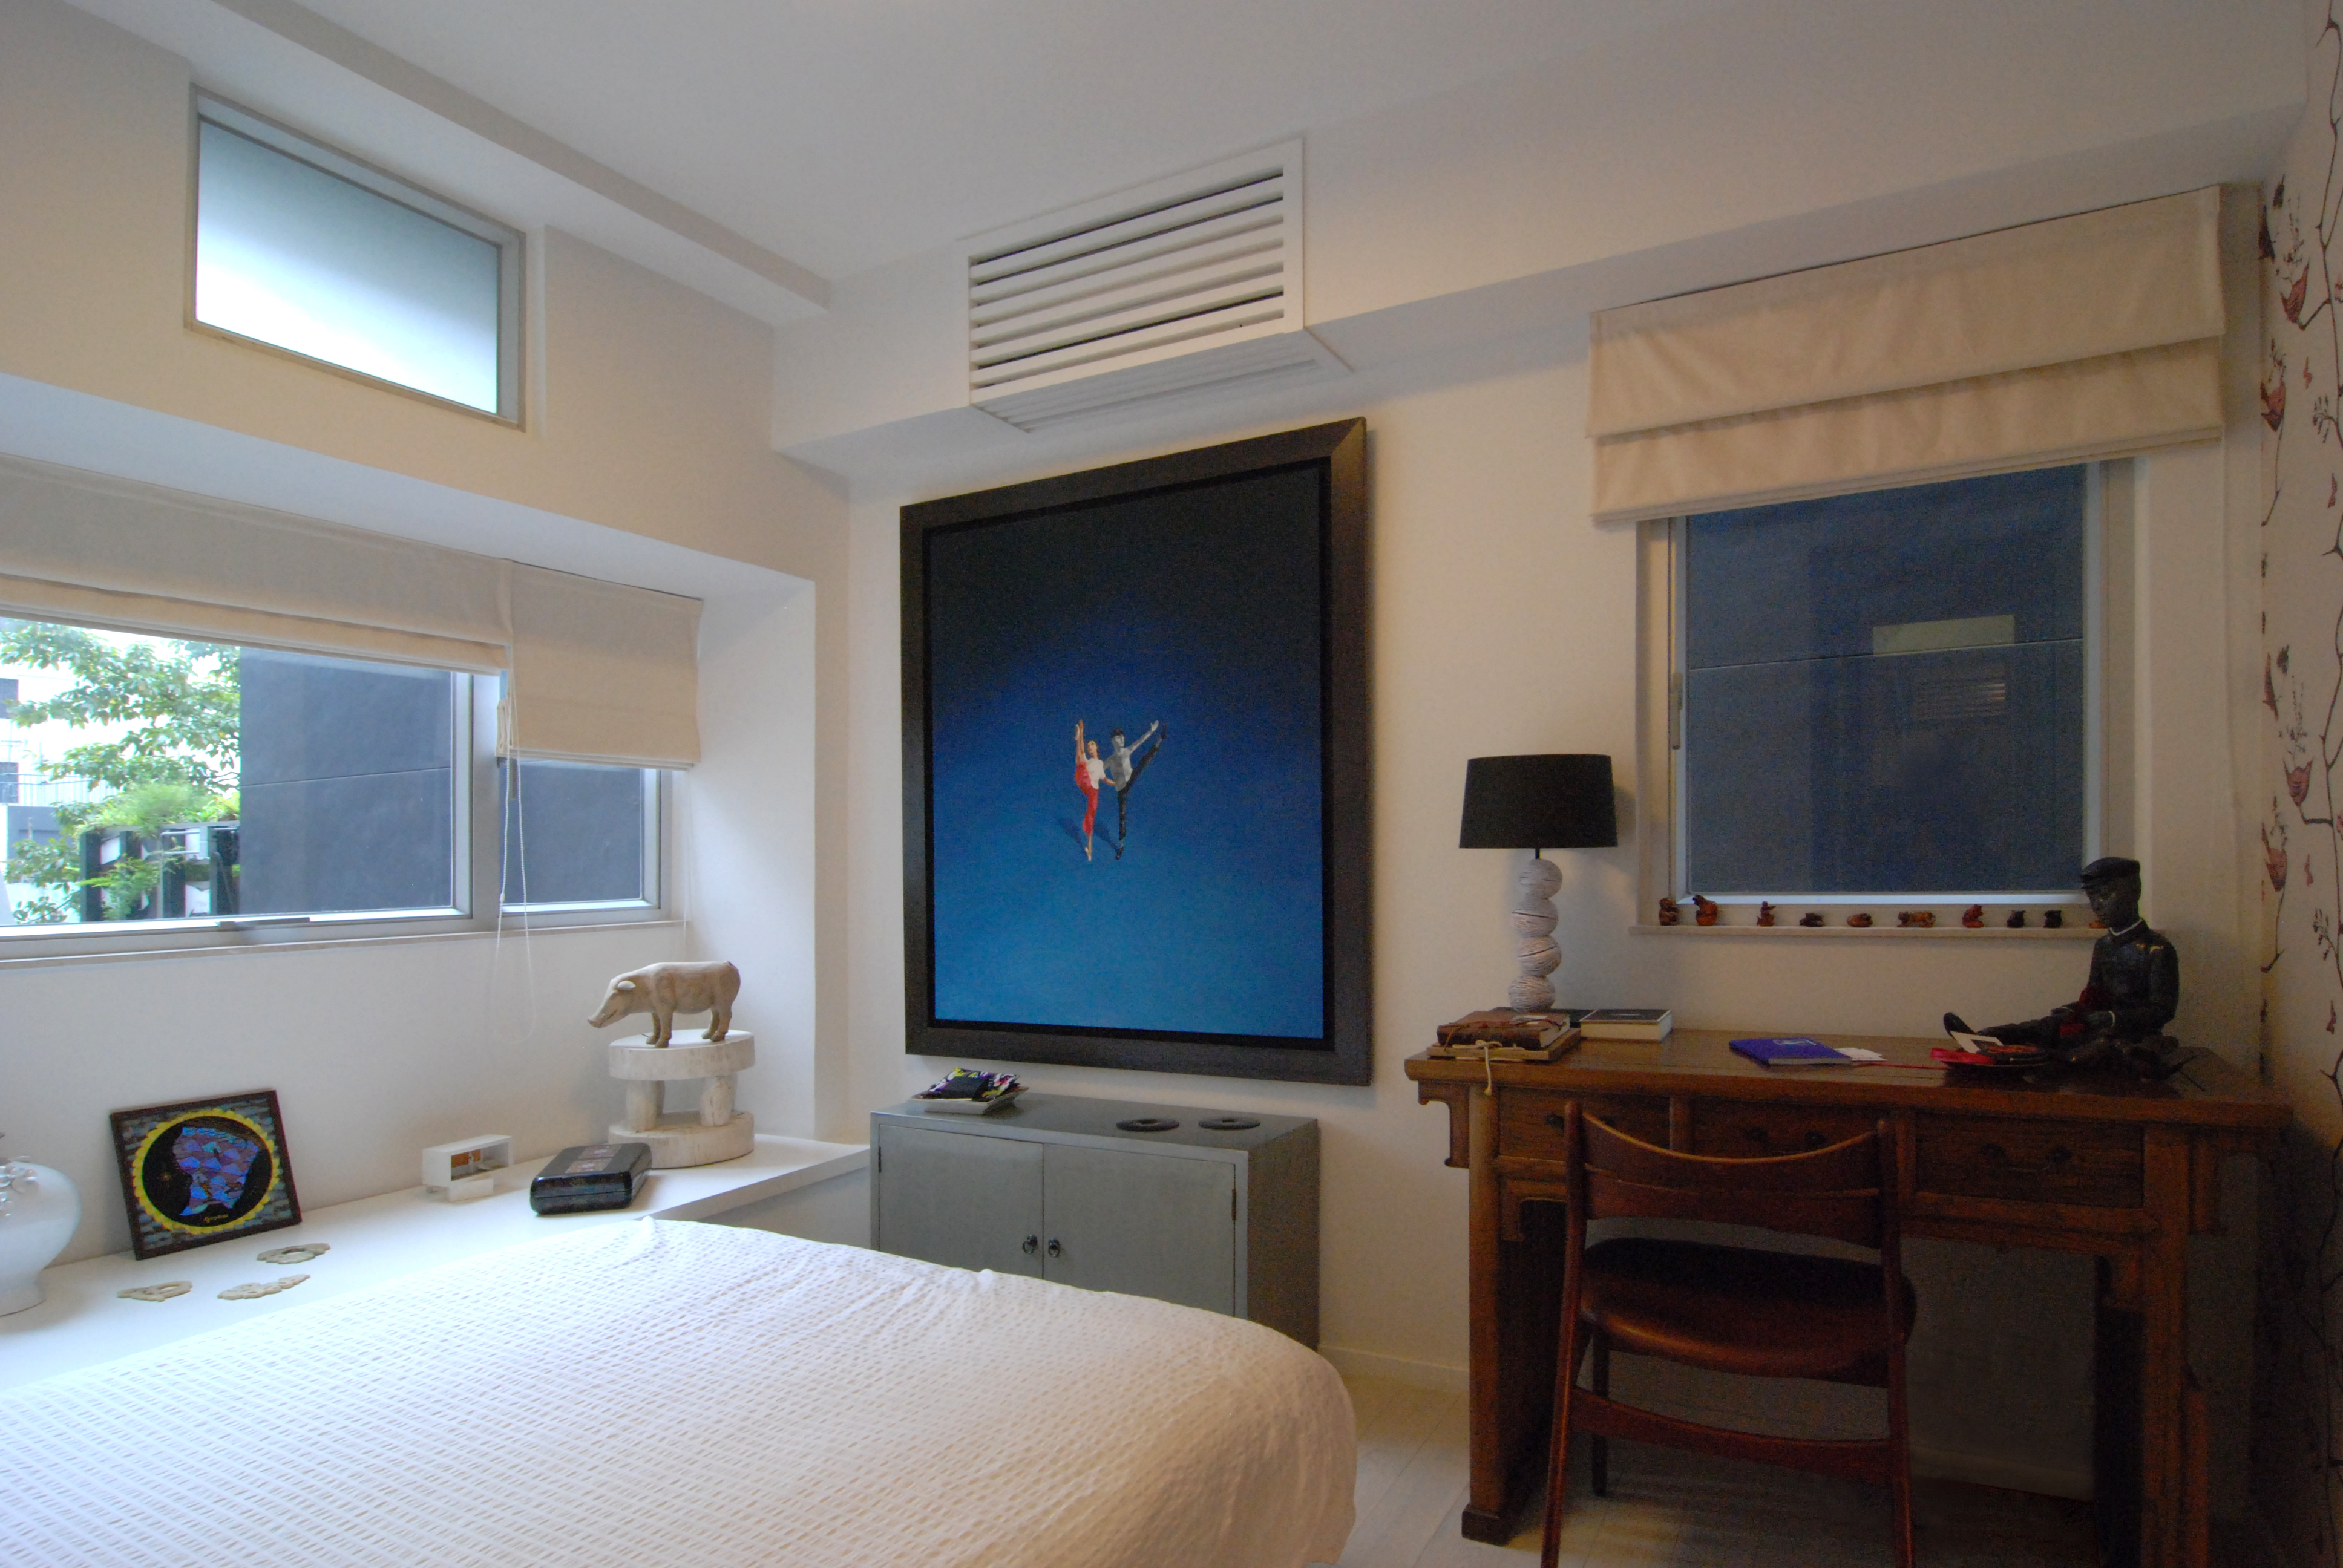 Stefano Tordiglione - Rednaxela Terrace - Bedroom 1